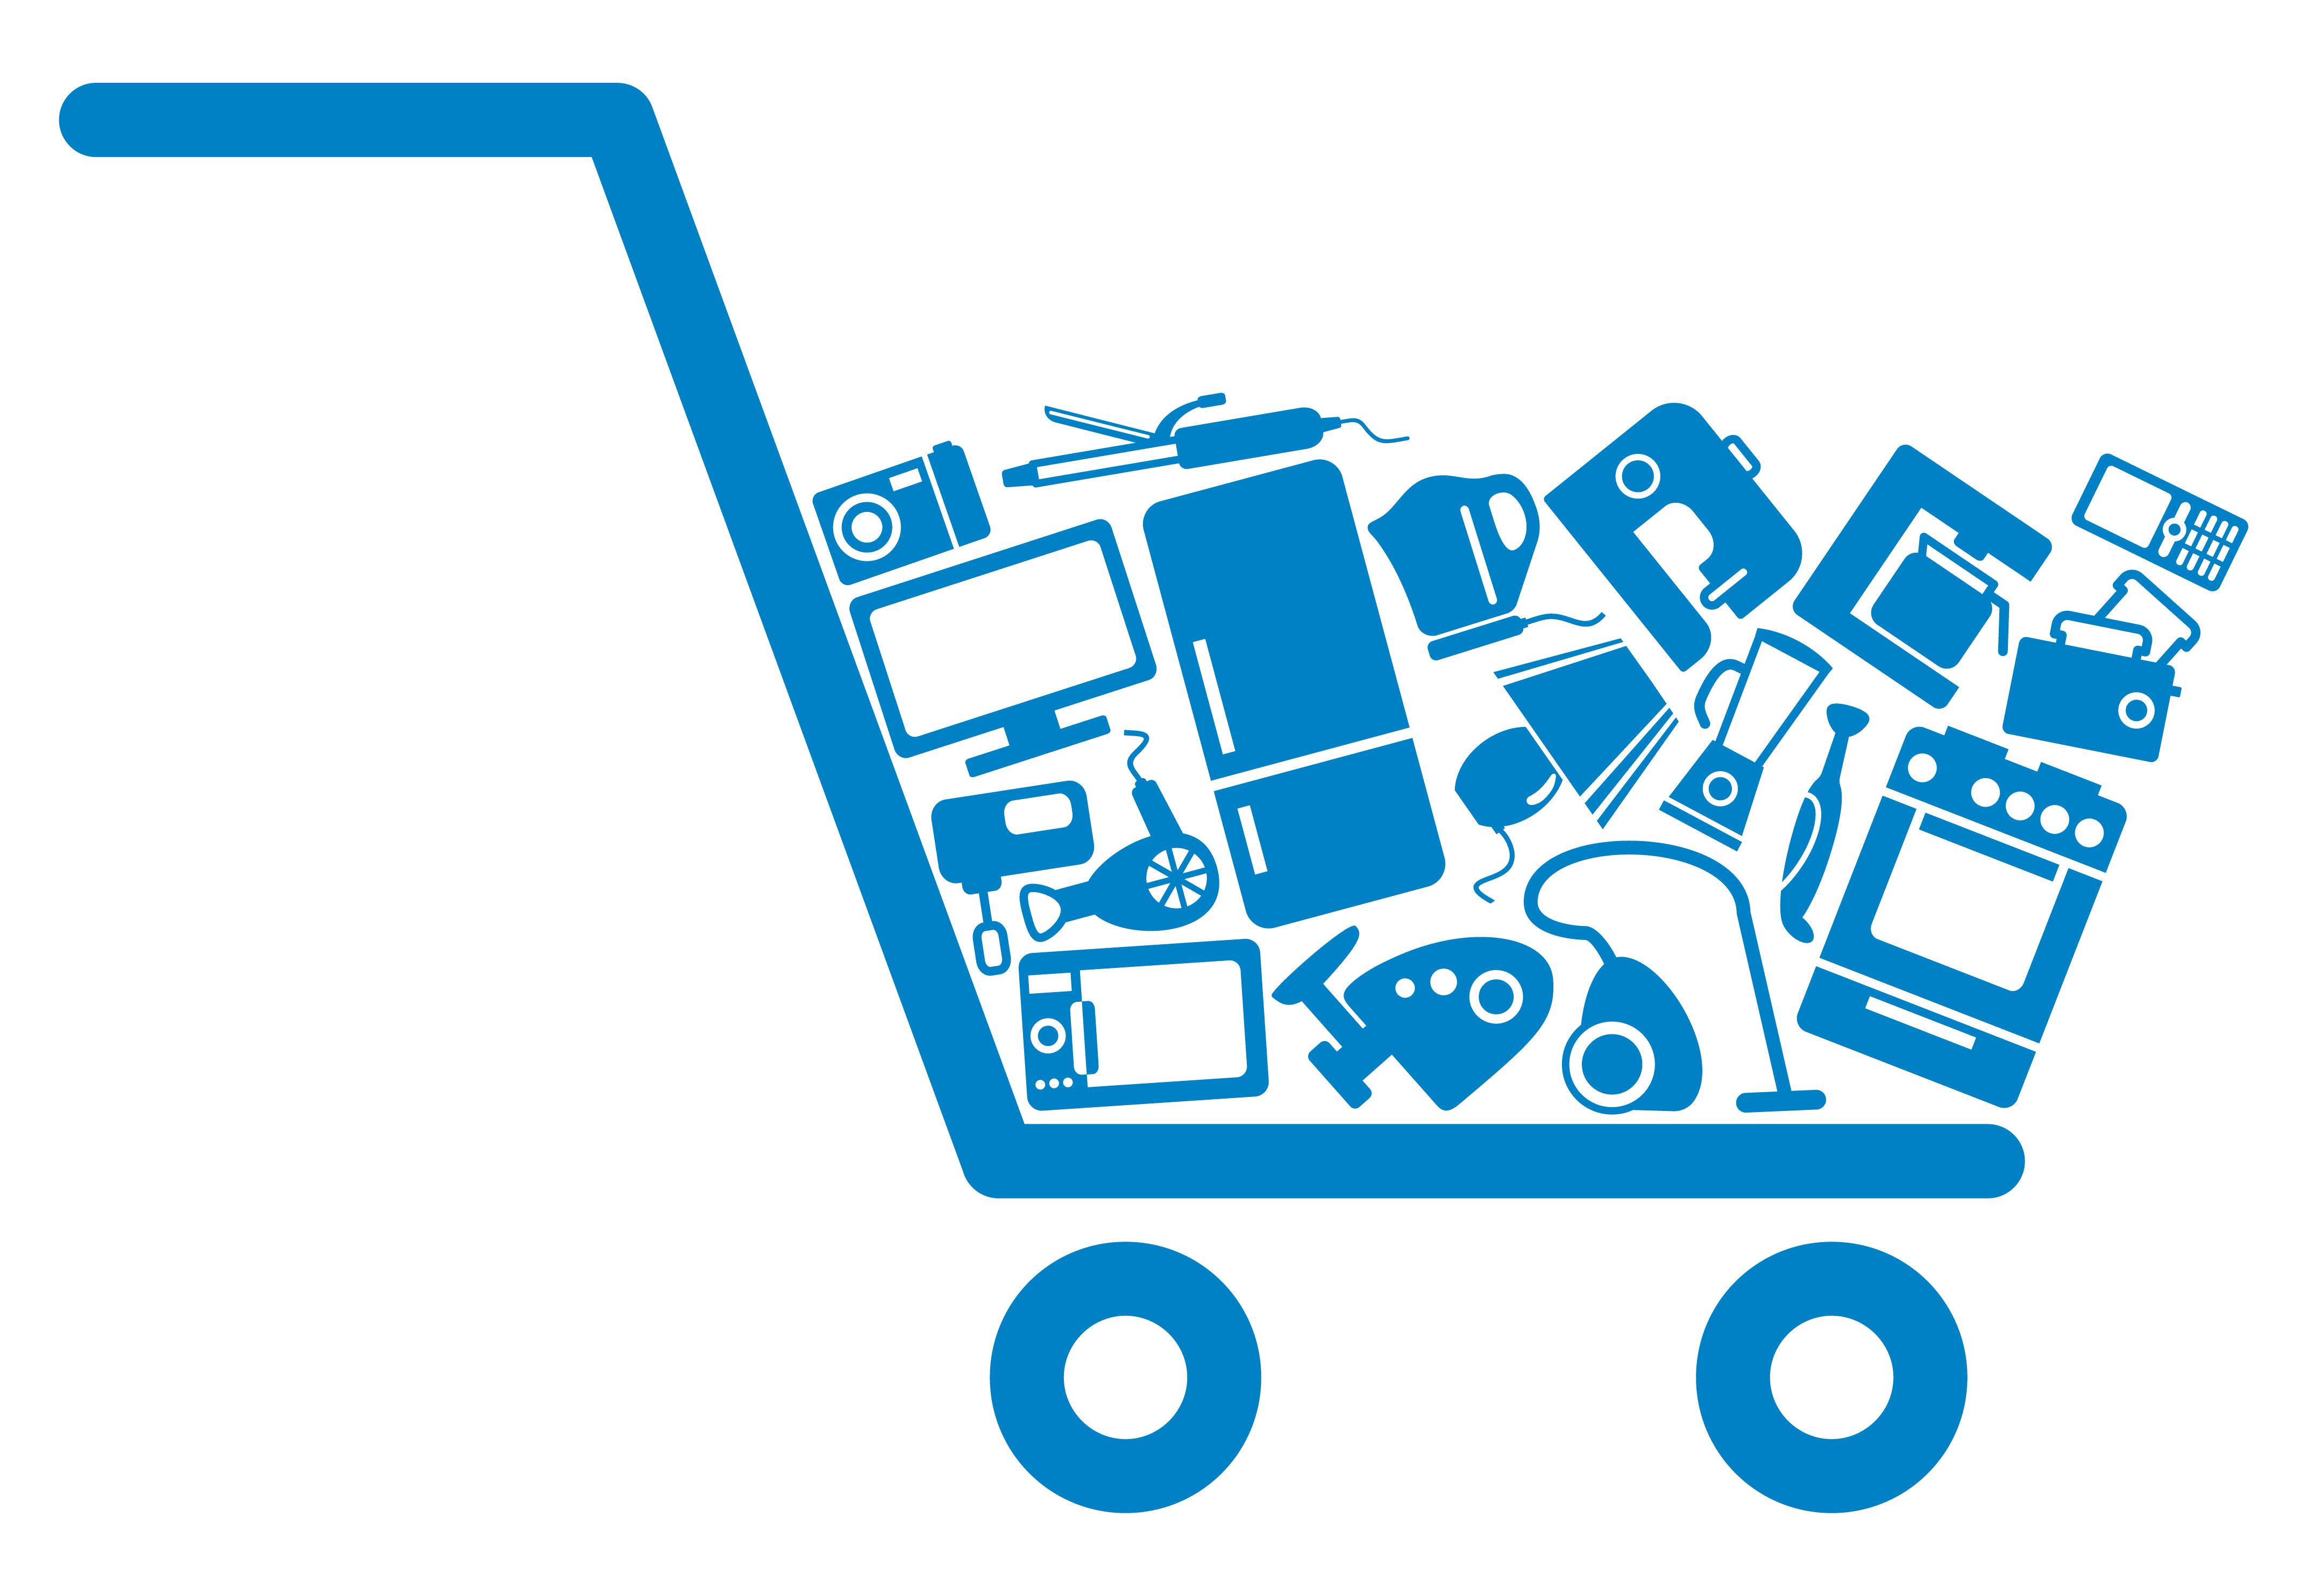 Cart online free illustration. Shop clipart customer